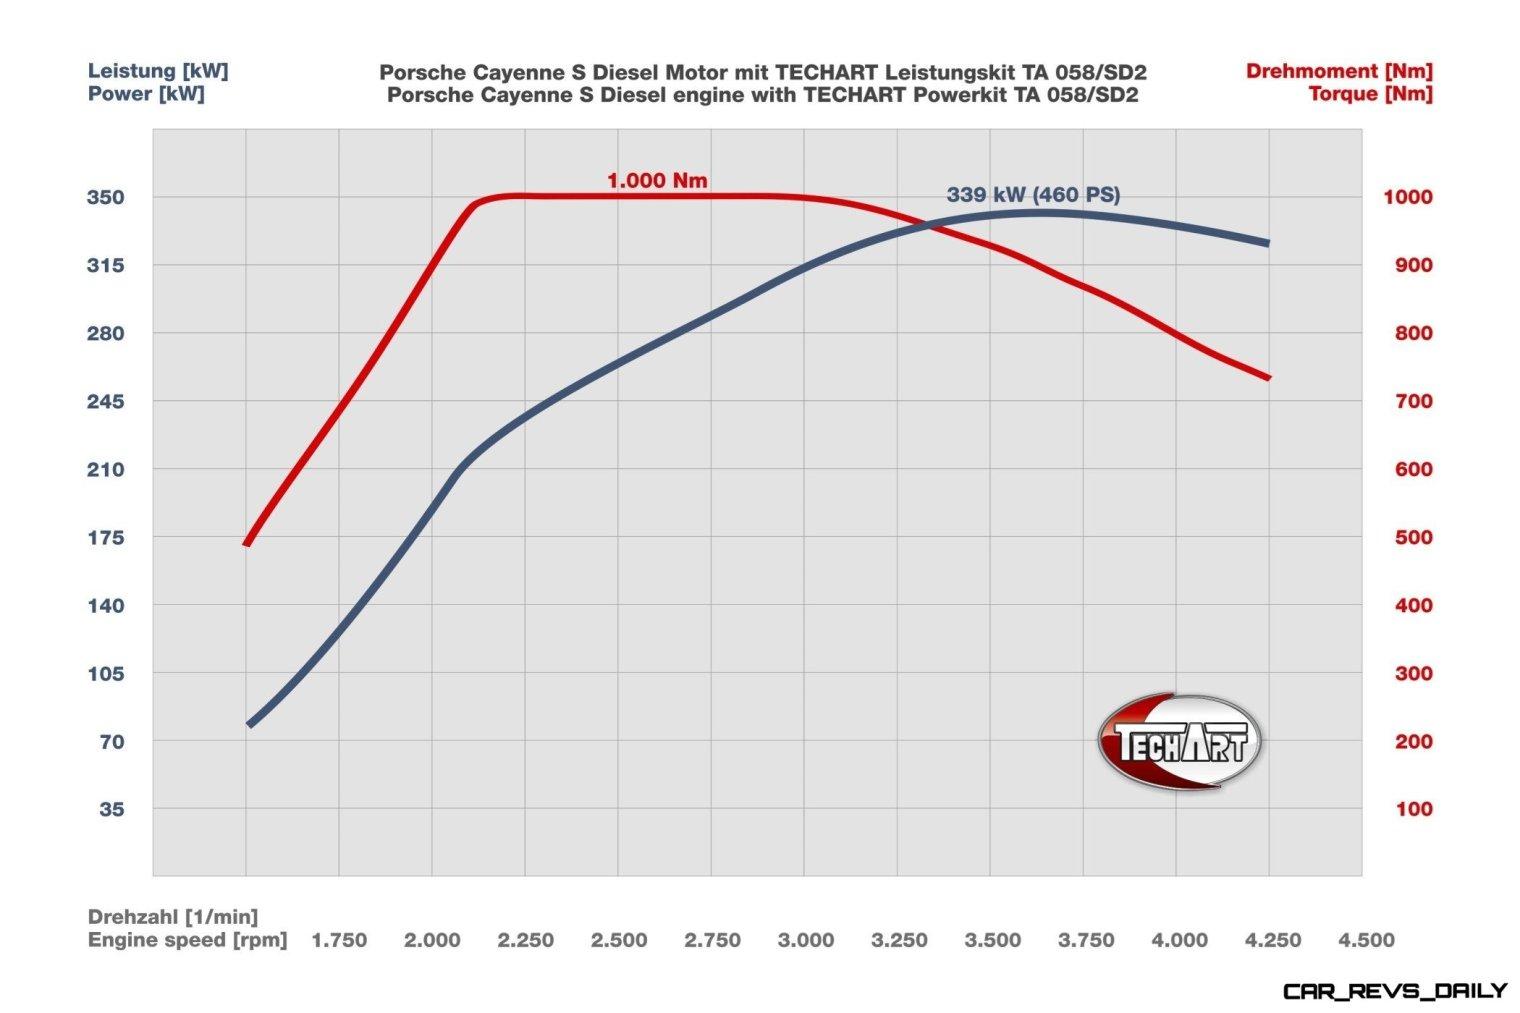 TECHART_Power_Kit_TA058_SD2_diagram